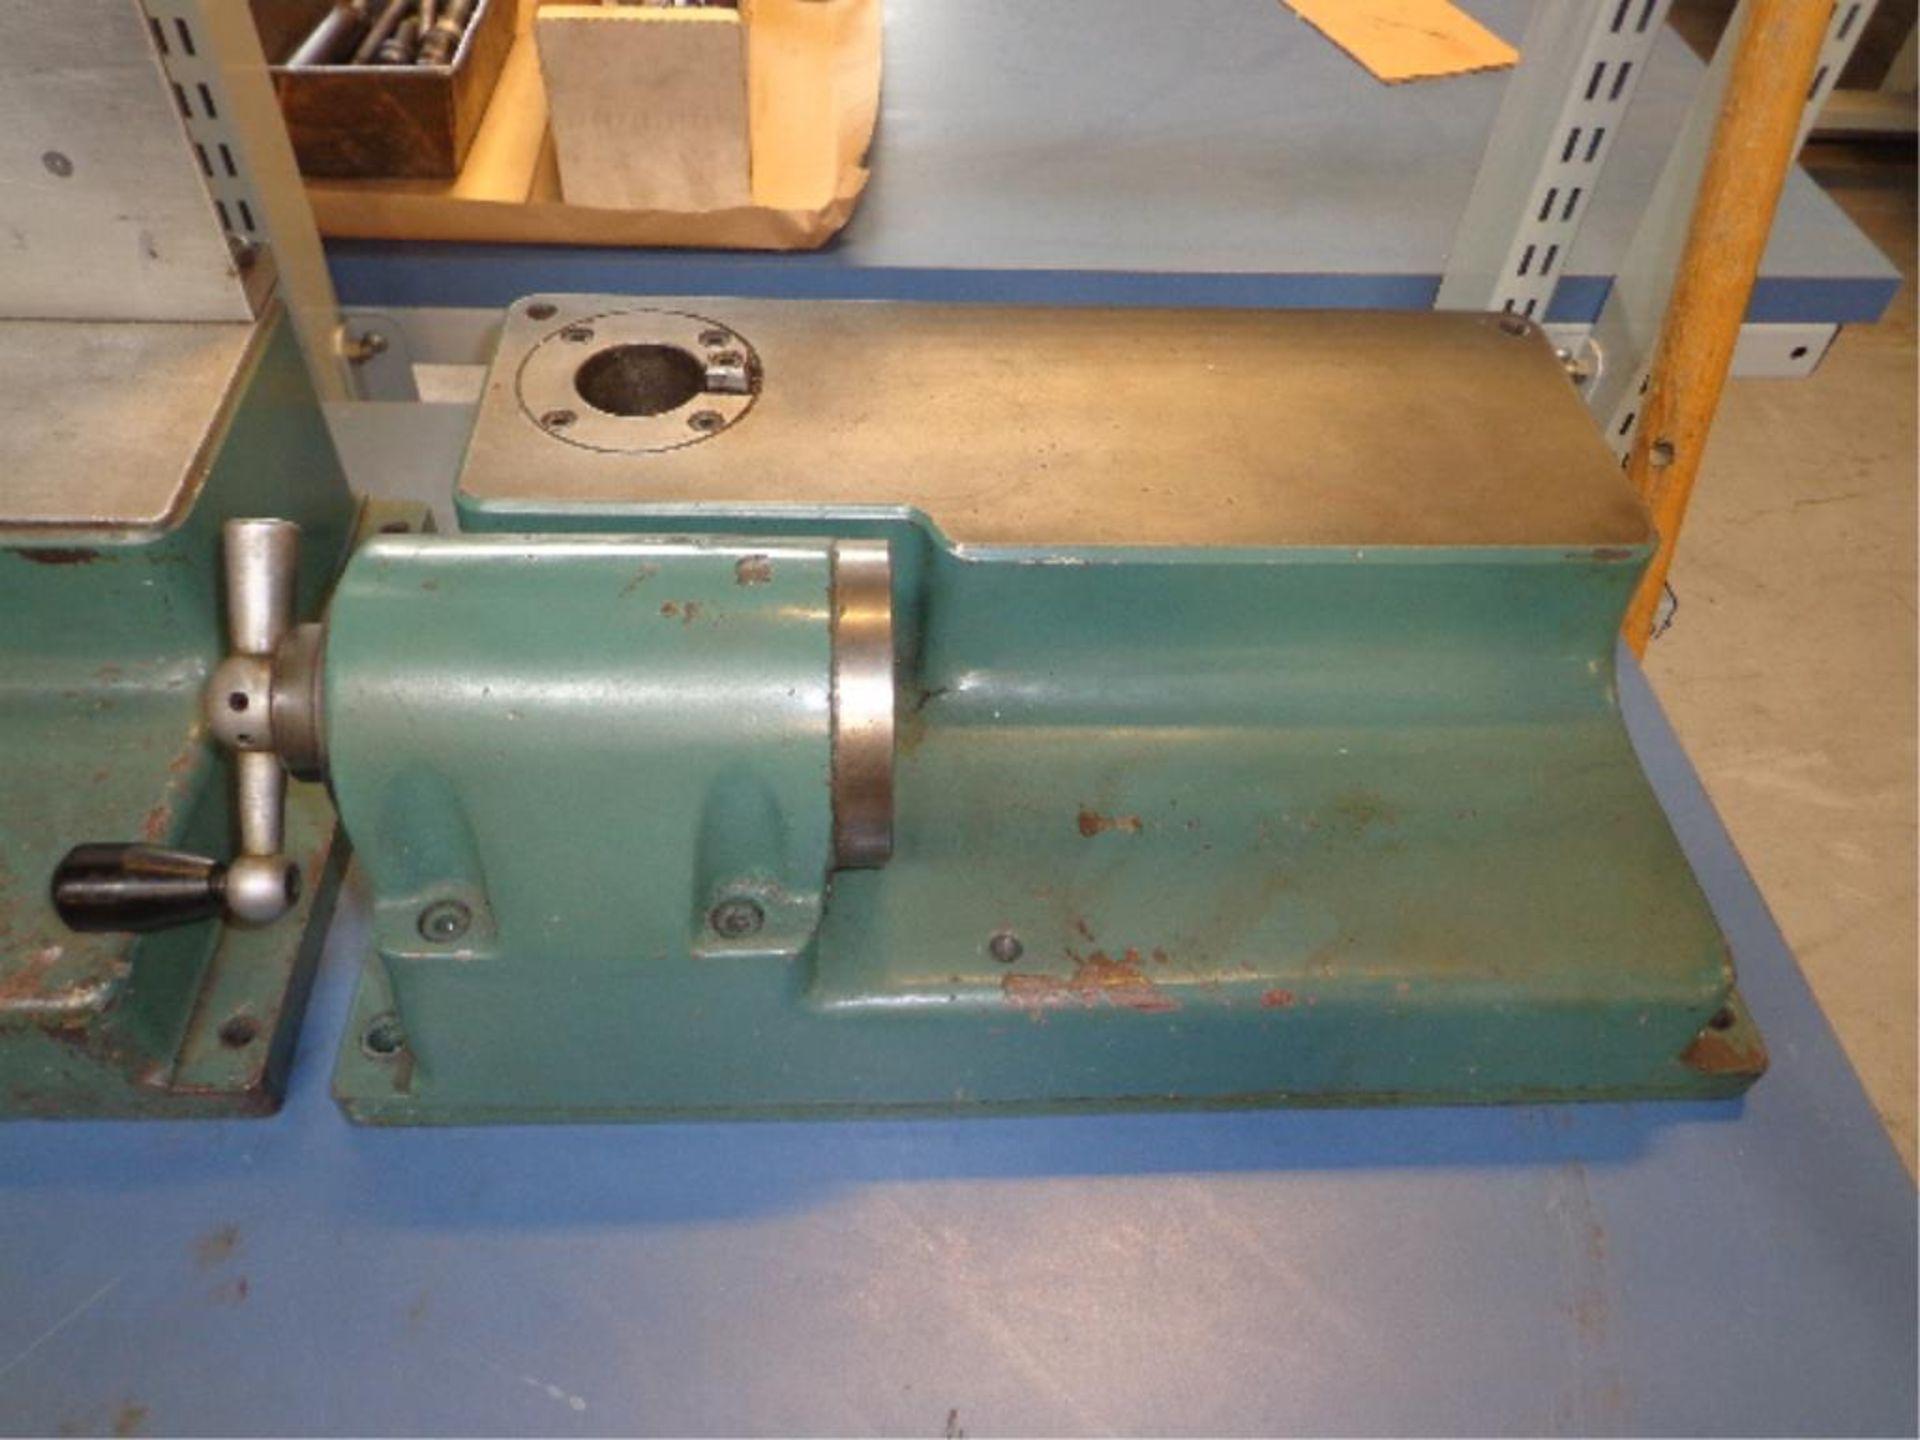 Lot 37 - Matsuura Machine Preloaders